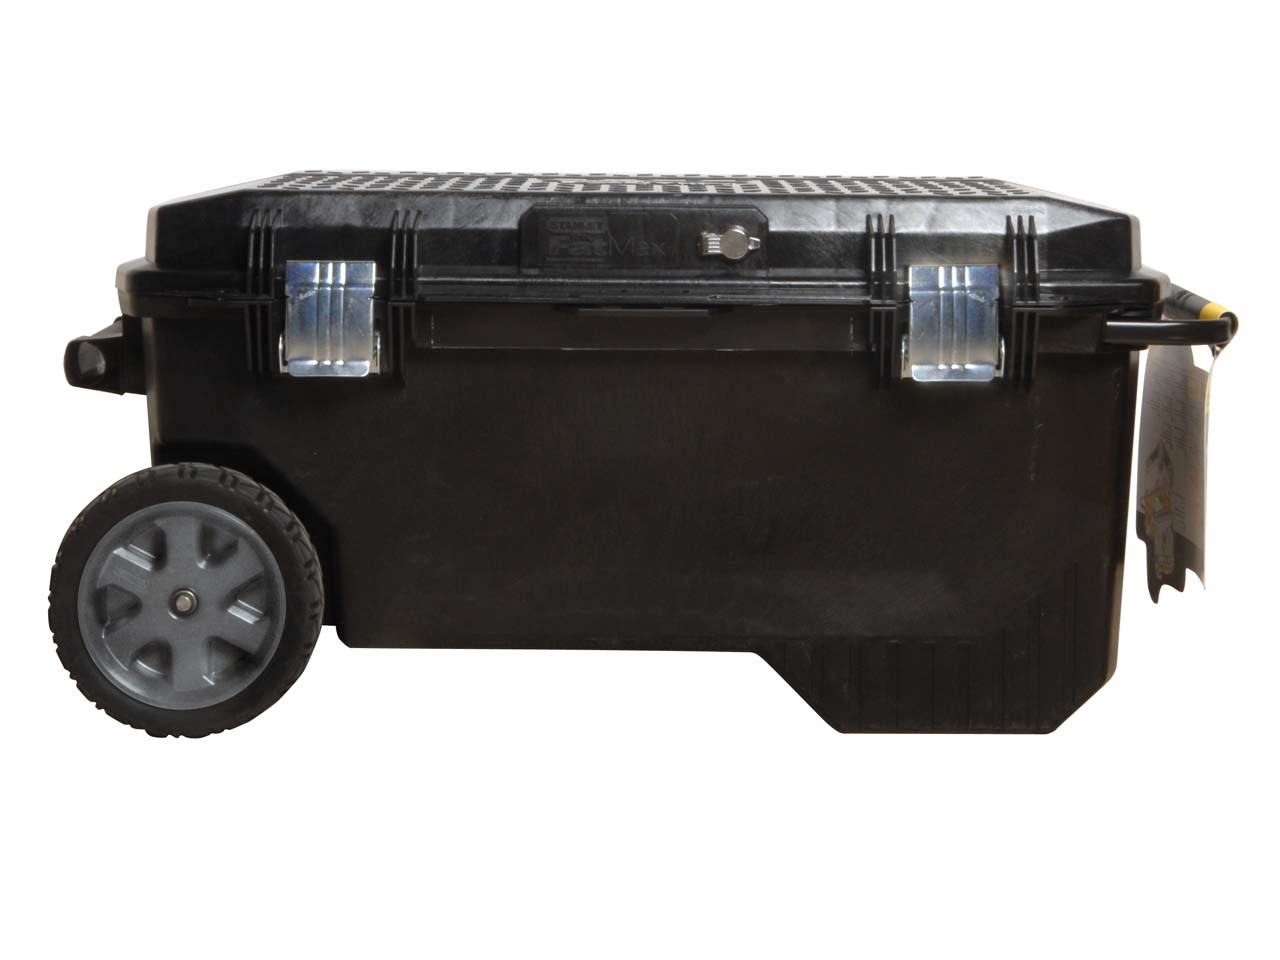 stanley sta194850 fatmax mobile job chest 30 gallon 113 litre. Black Bedroom Furniture Sets. Home Design Ideas